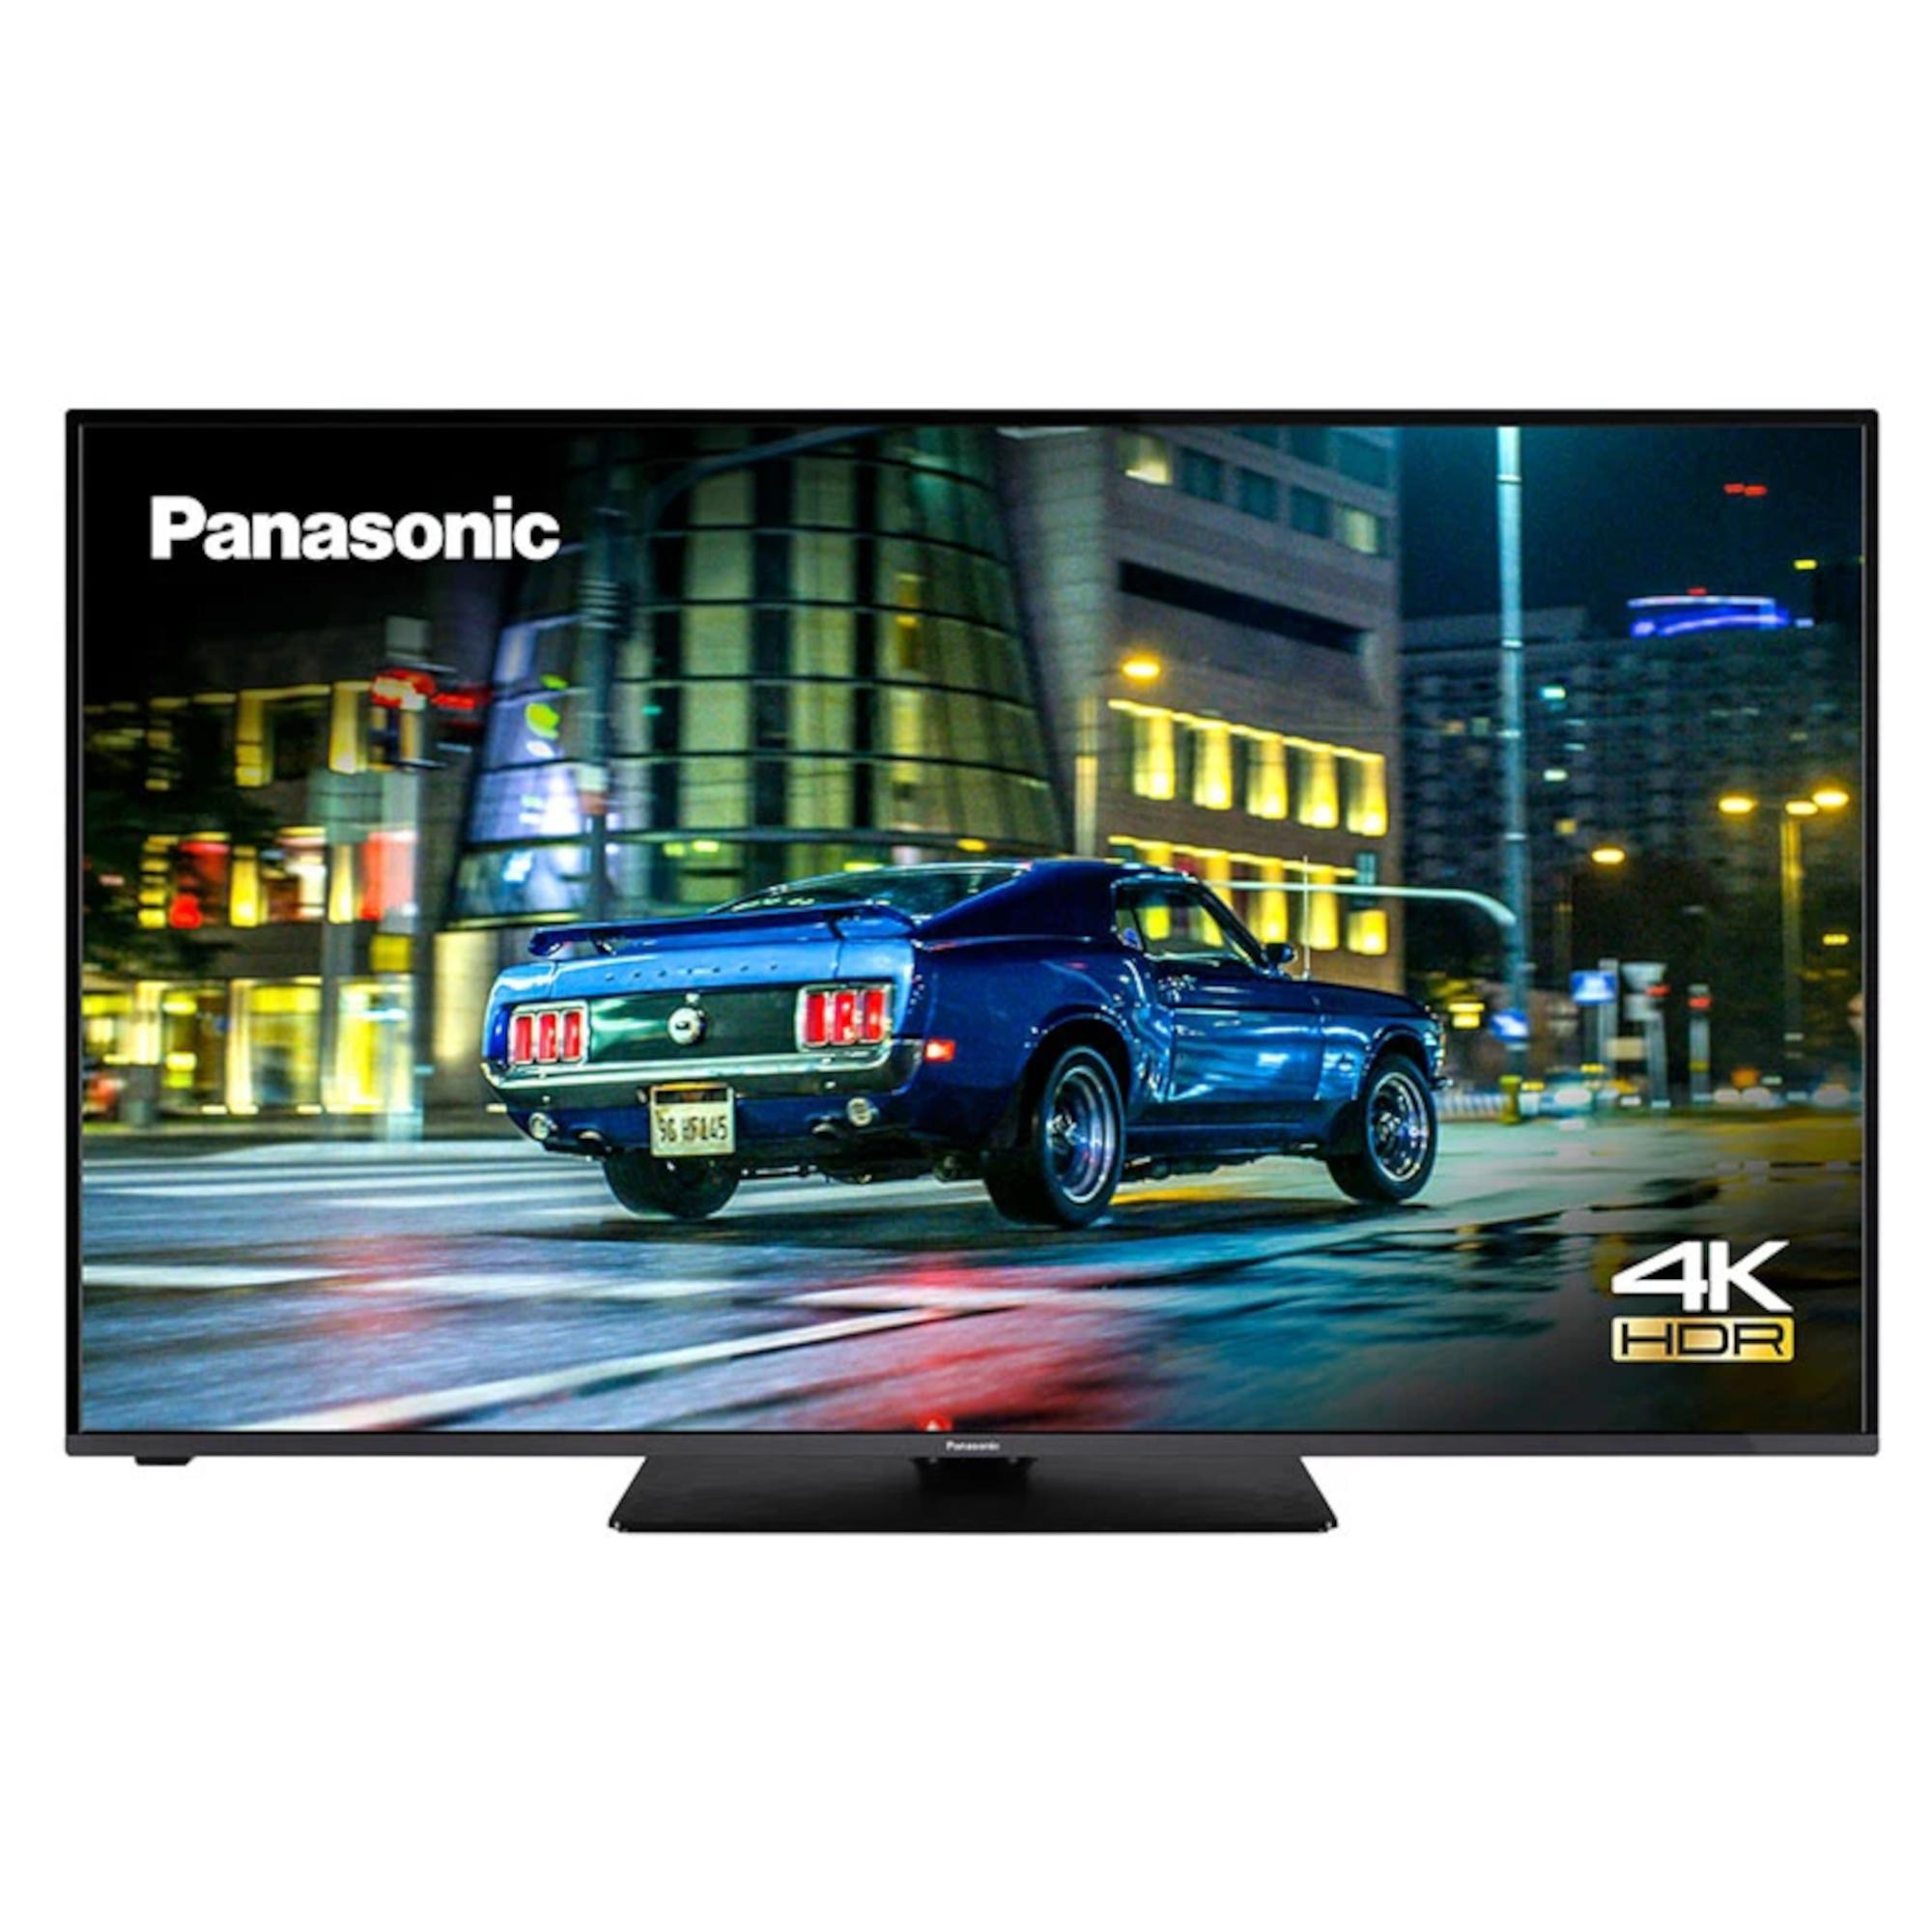 "Panasonic TX43HX580B 43"" Smart 4K Ultra HD HDR LED TV for £369 delivered @ Hughes"